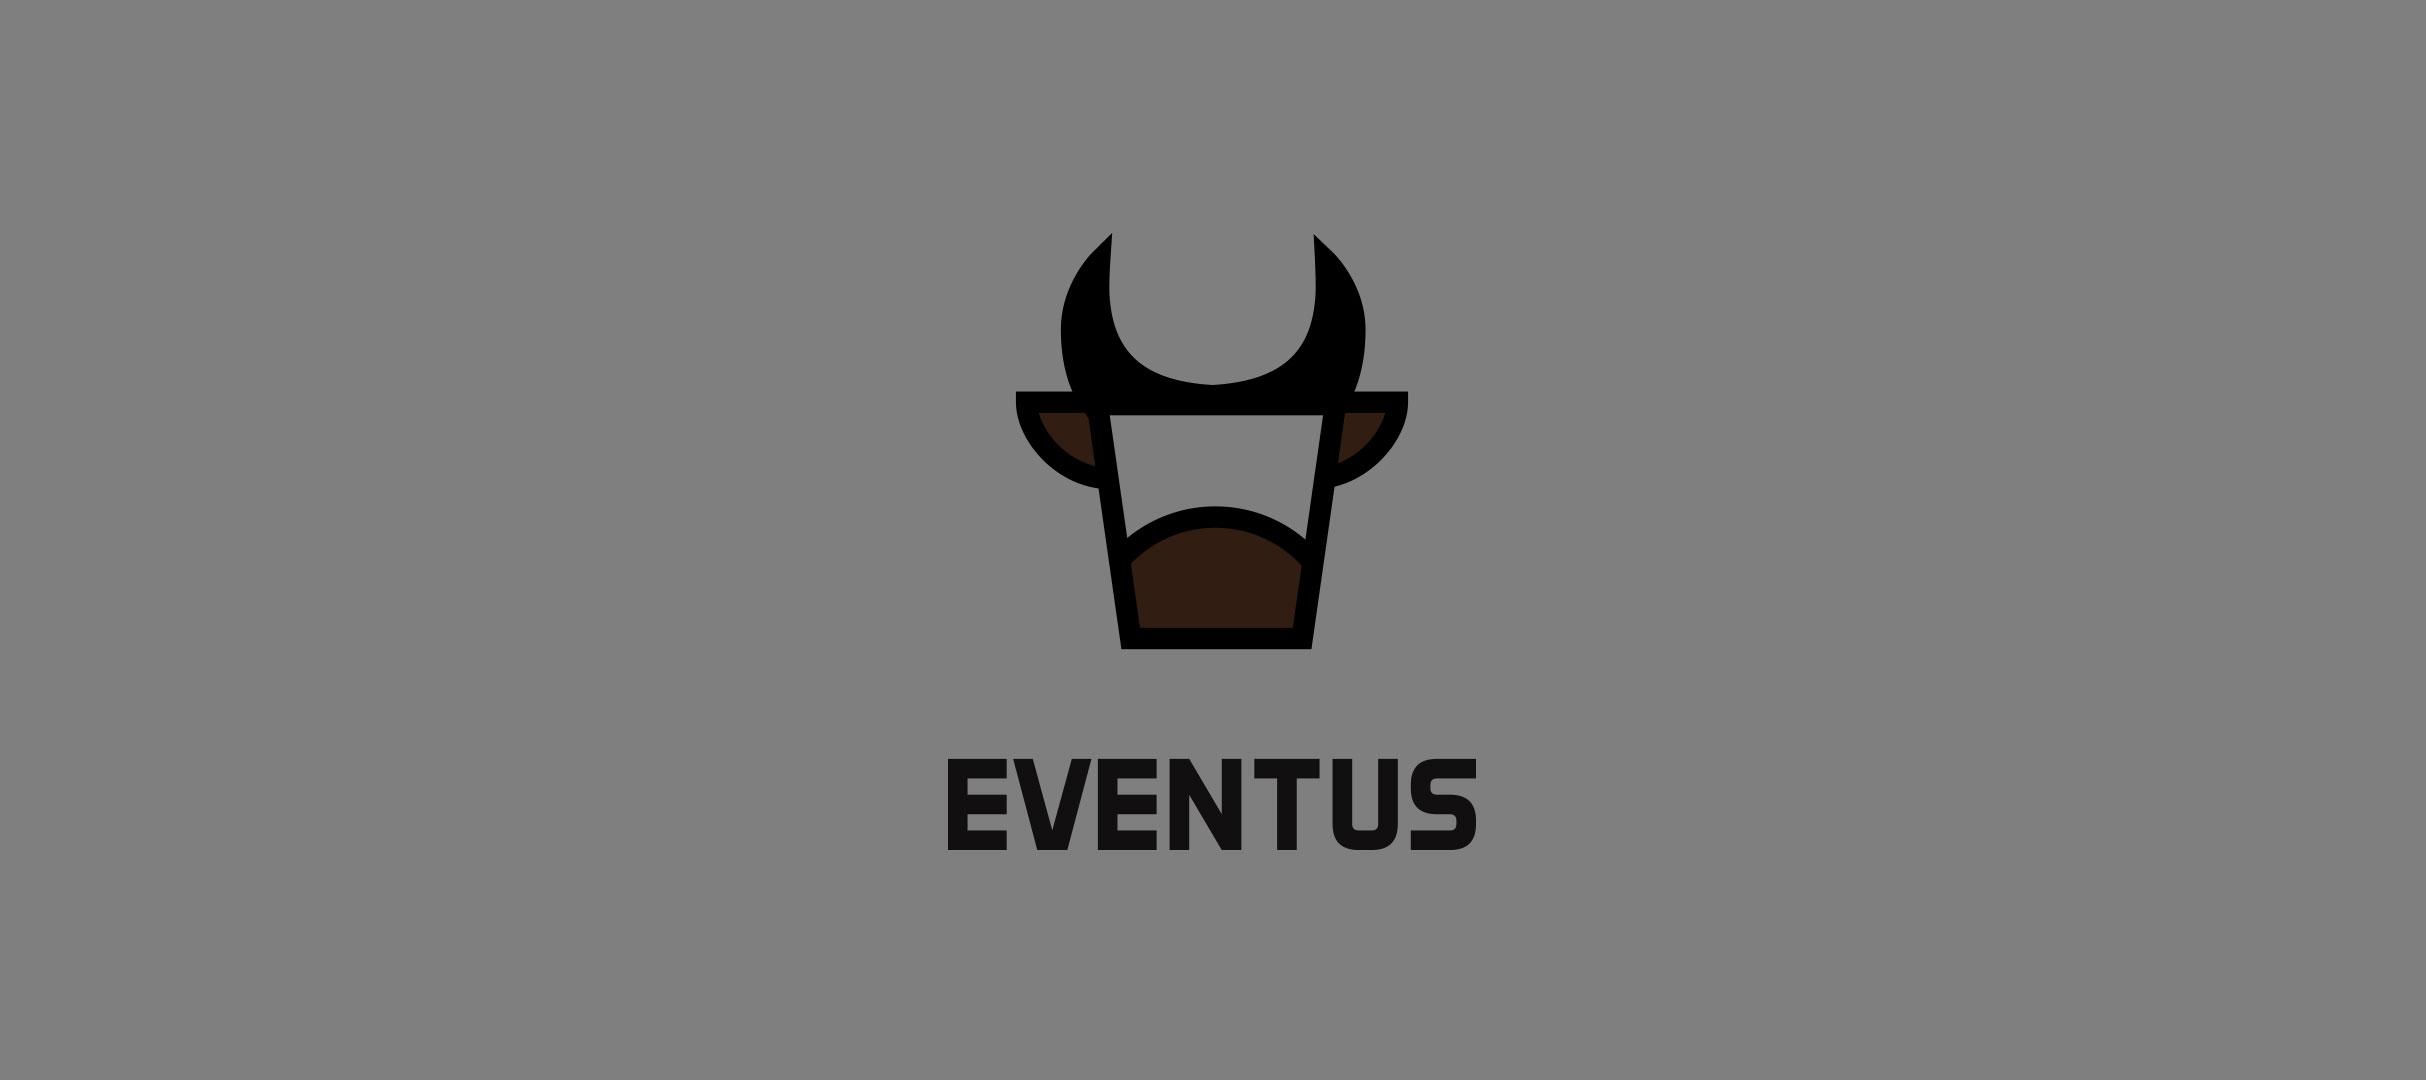 Eventus - HaukeWebs